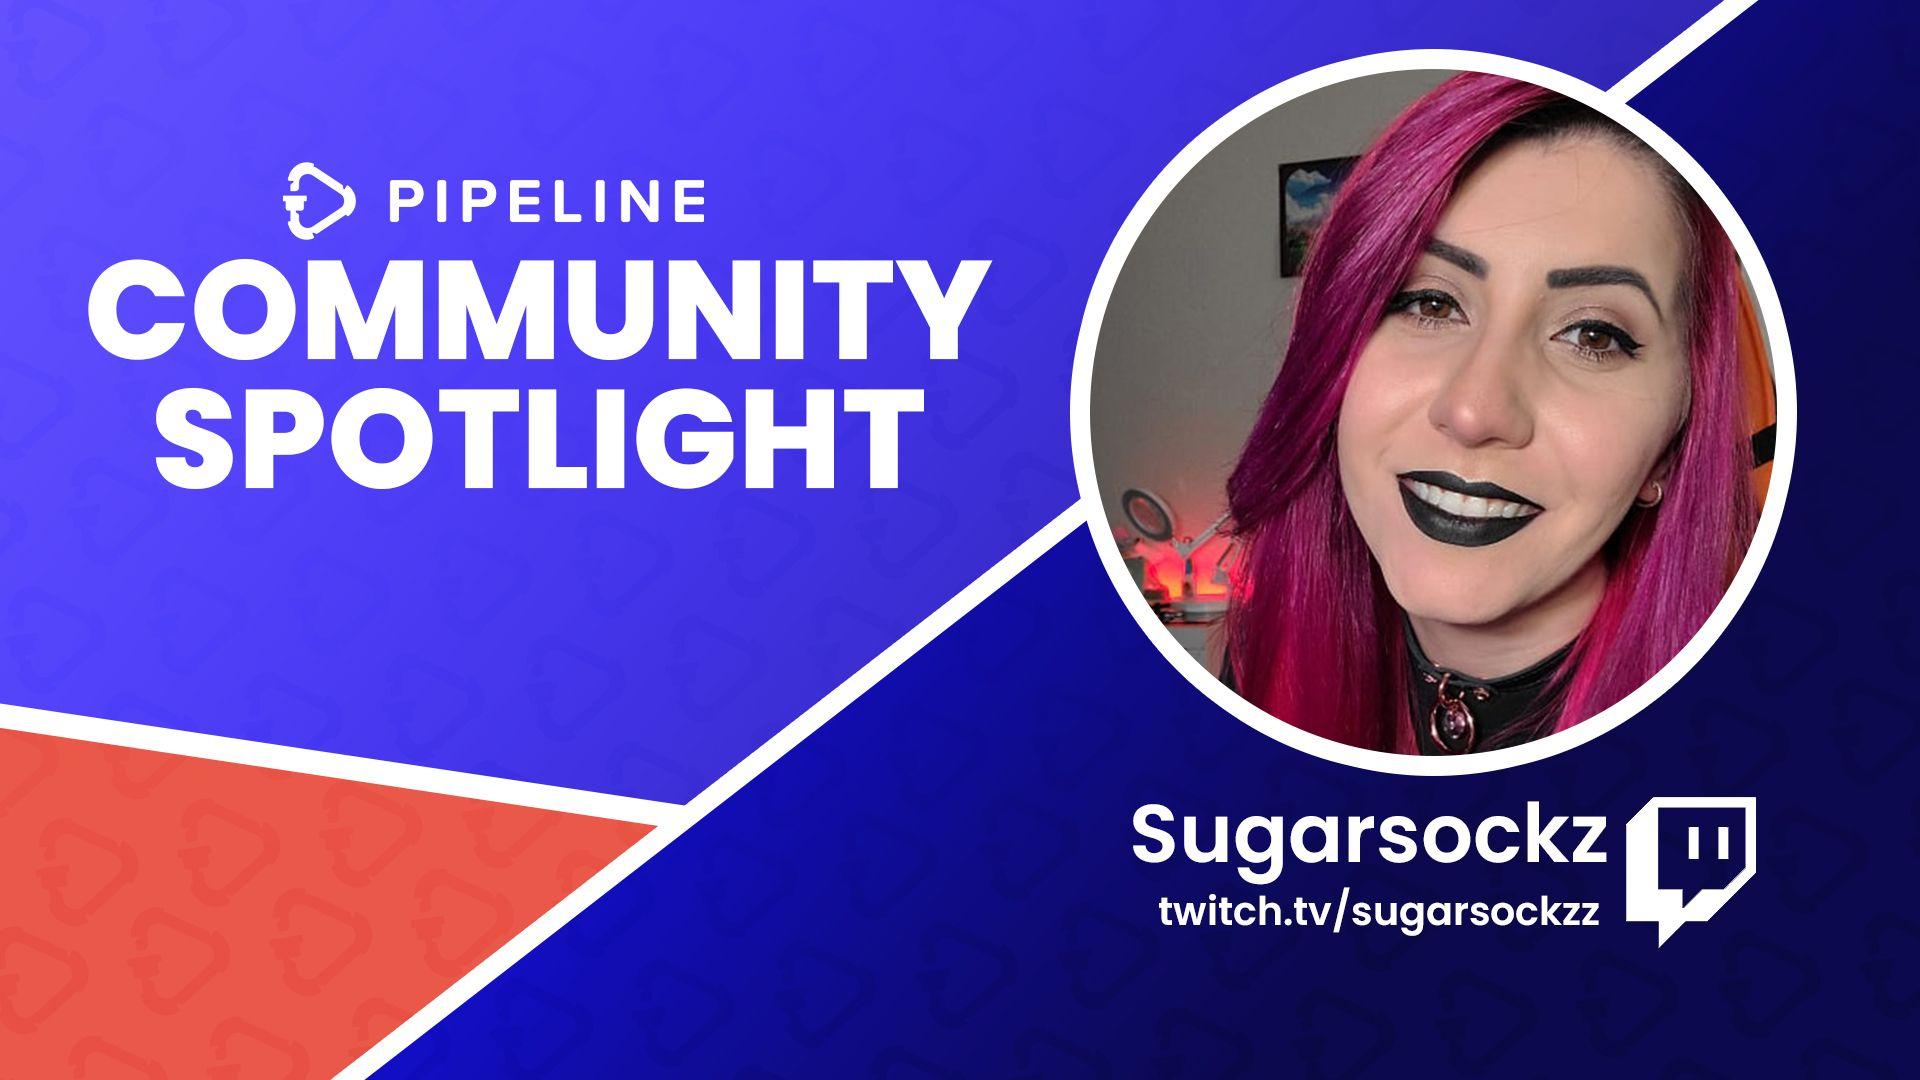 Community Spotlight: Sugarsockz